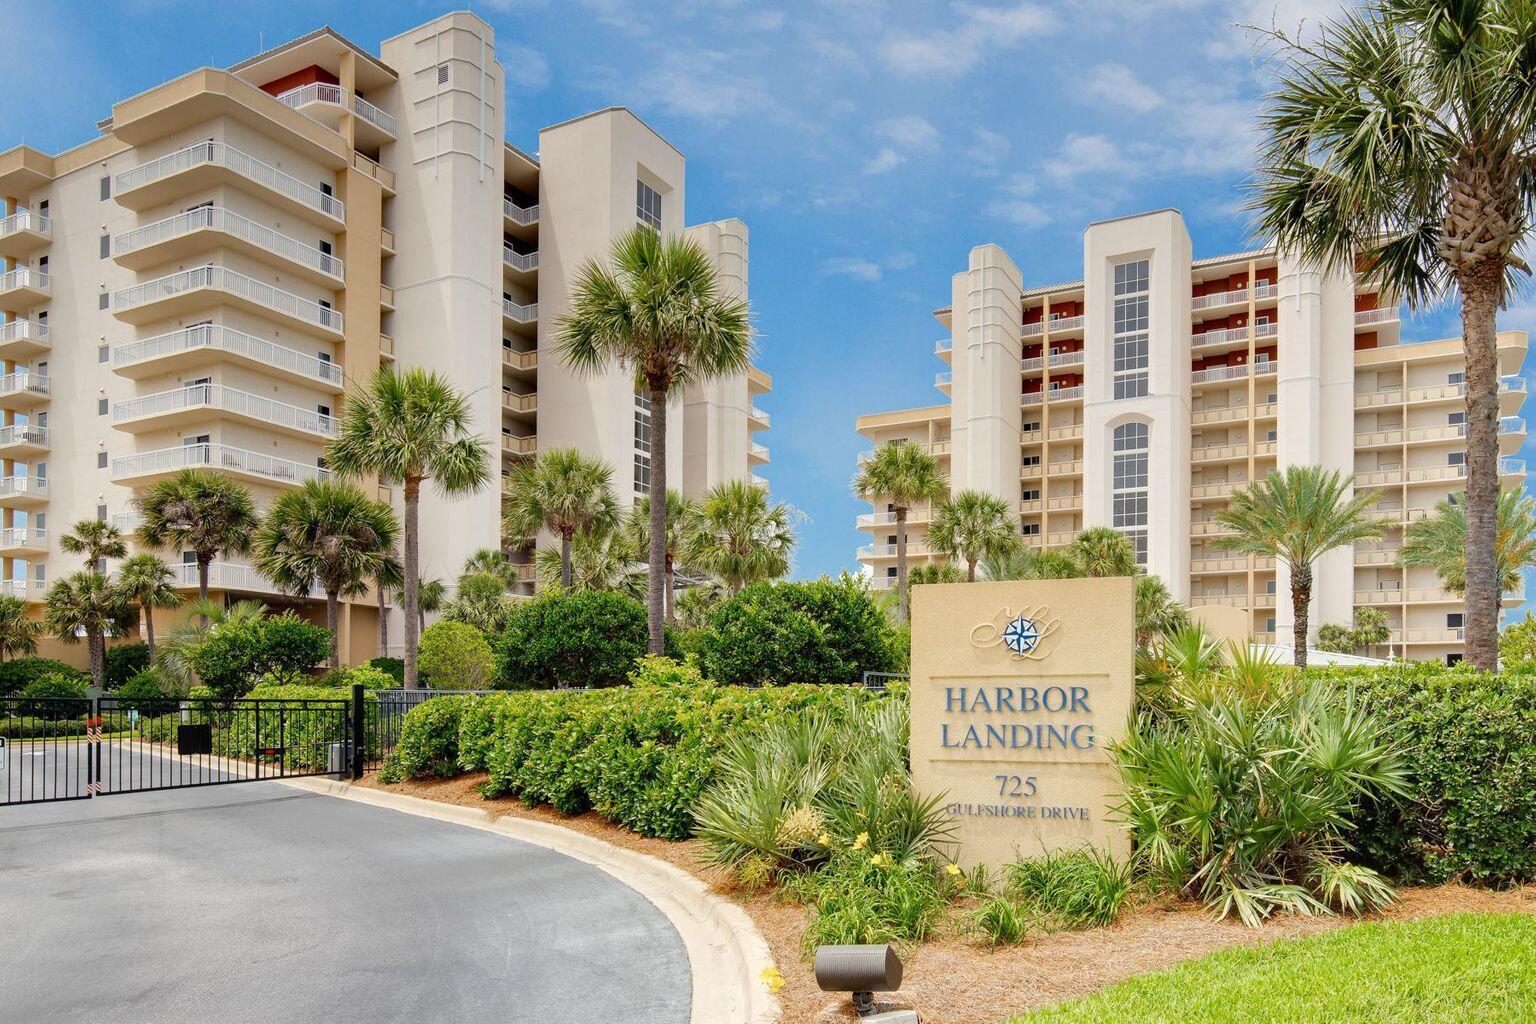 725 Gulf Shore Drive UNIT 101B, Destin, FL 32541